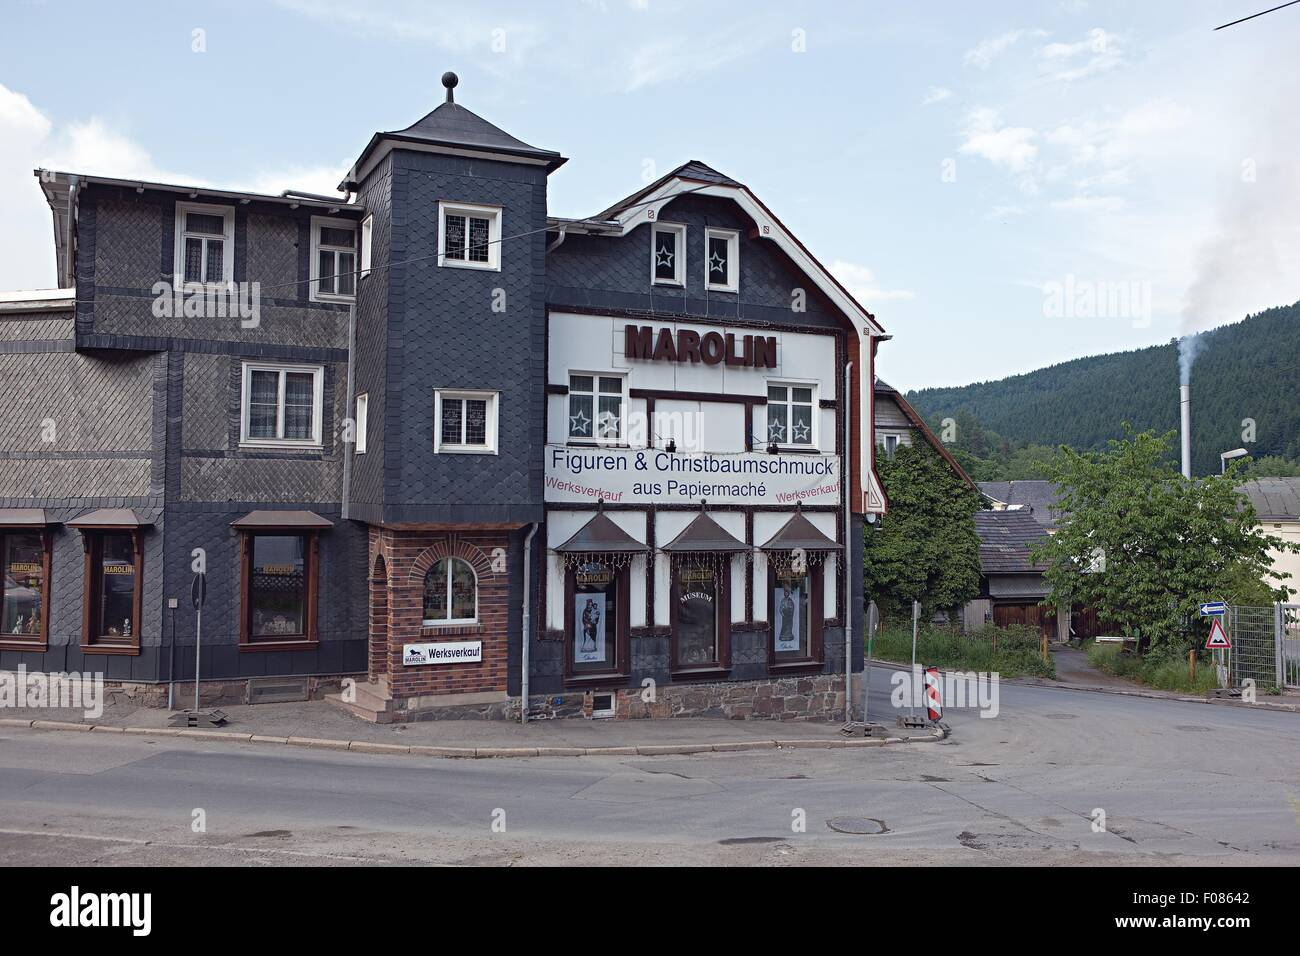 Facade of Marolin Company in Steinach, Switzerland - Stock Image